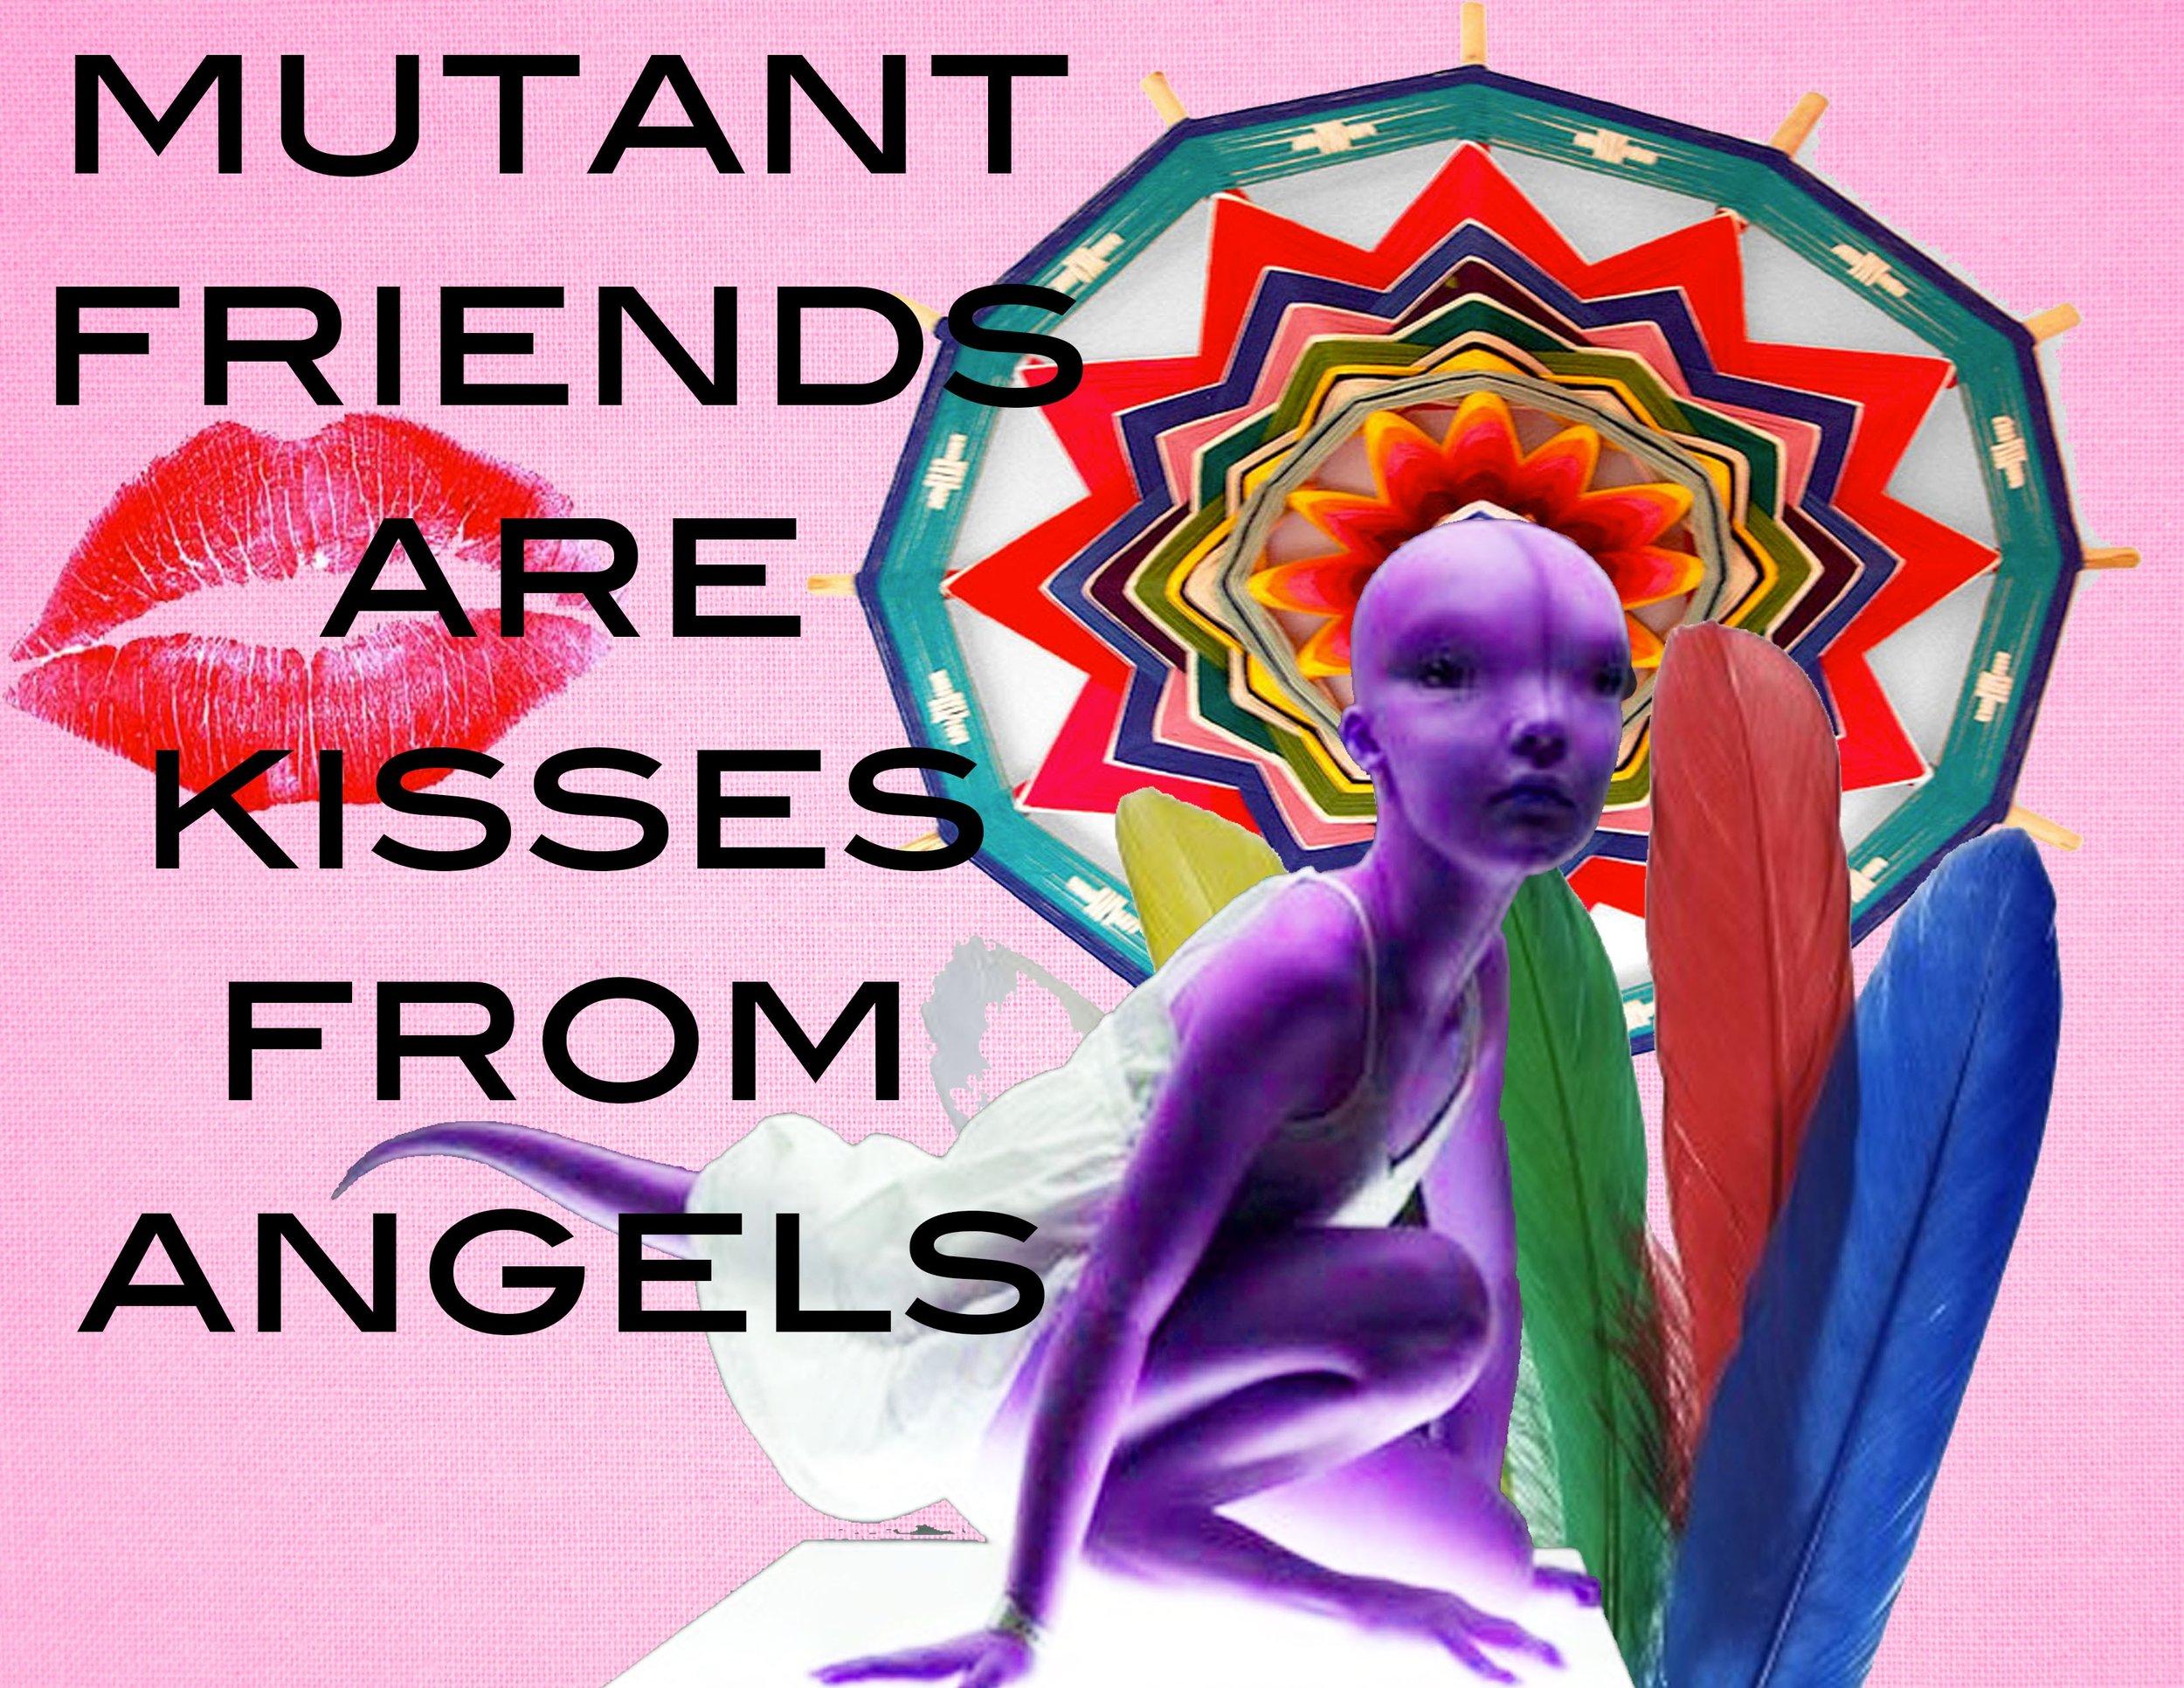 mutanfriends.jpg